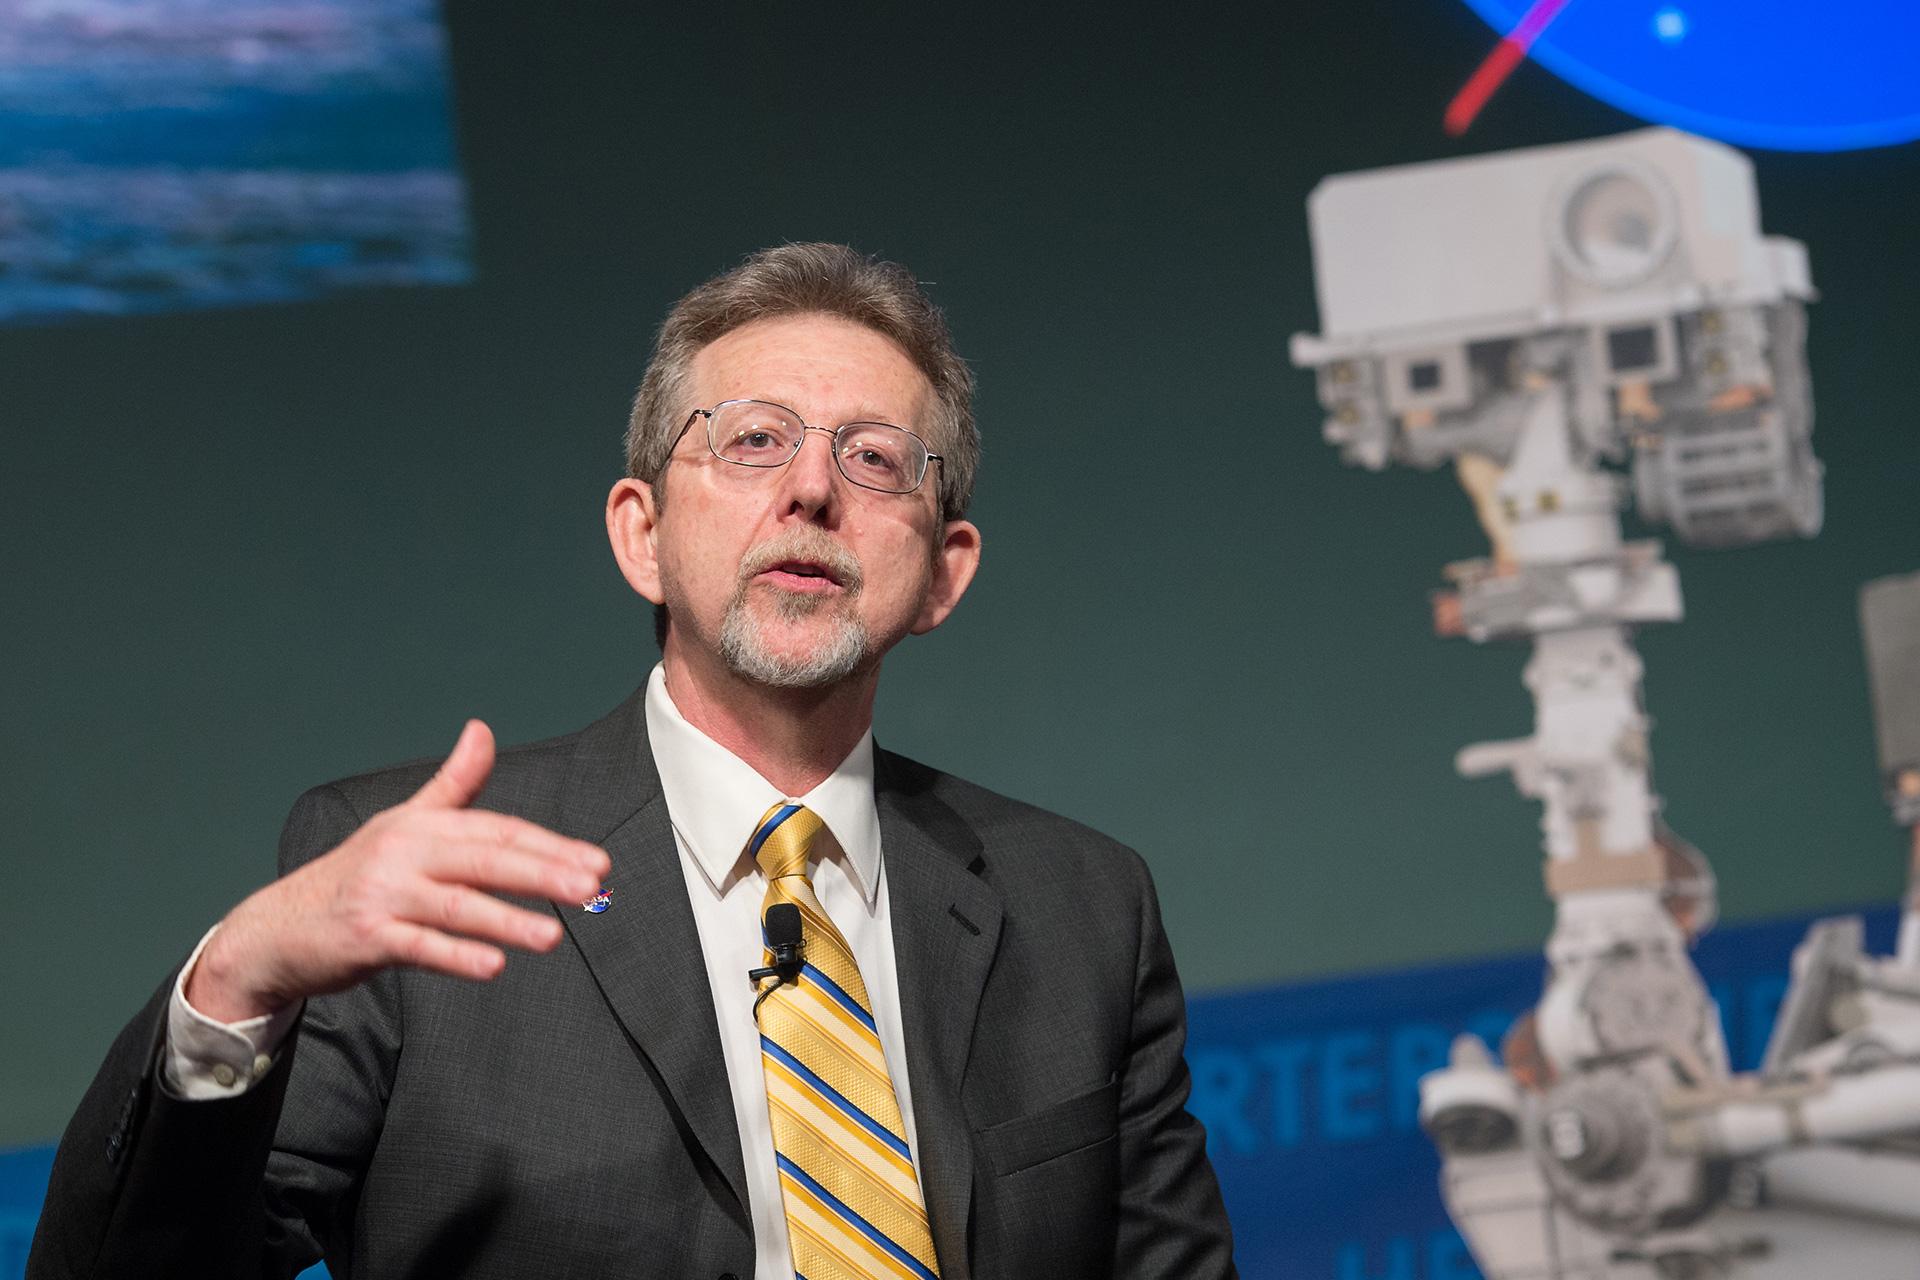 NASA's chief scientist will retire in 2022 | Engadget